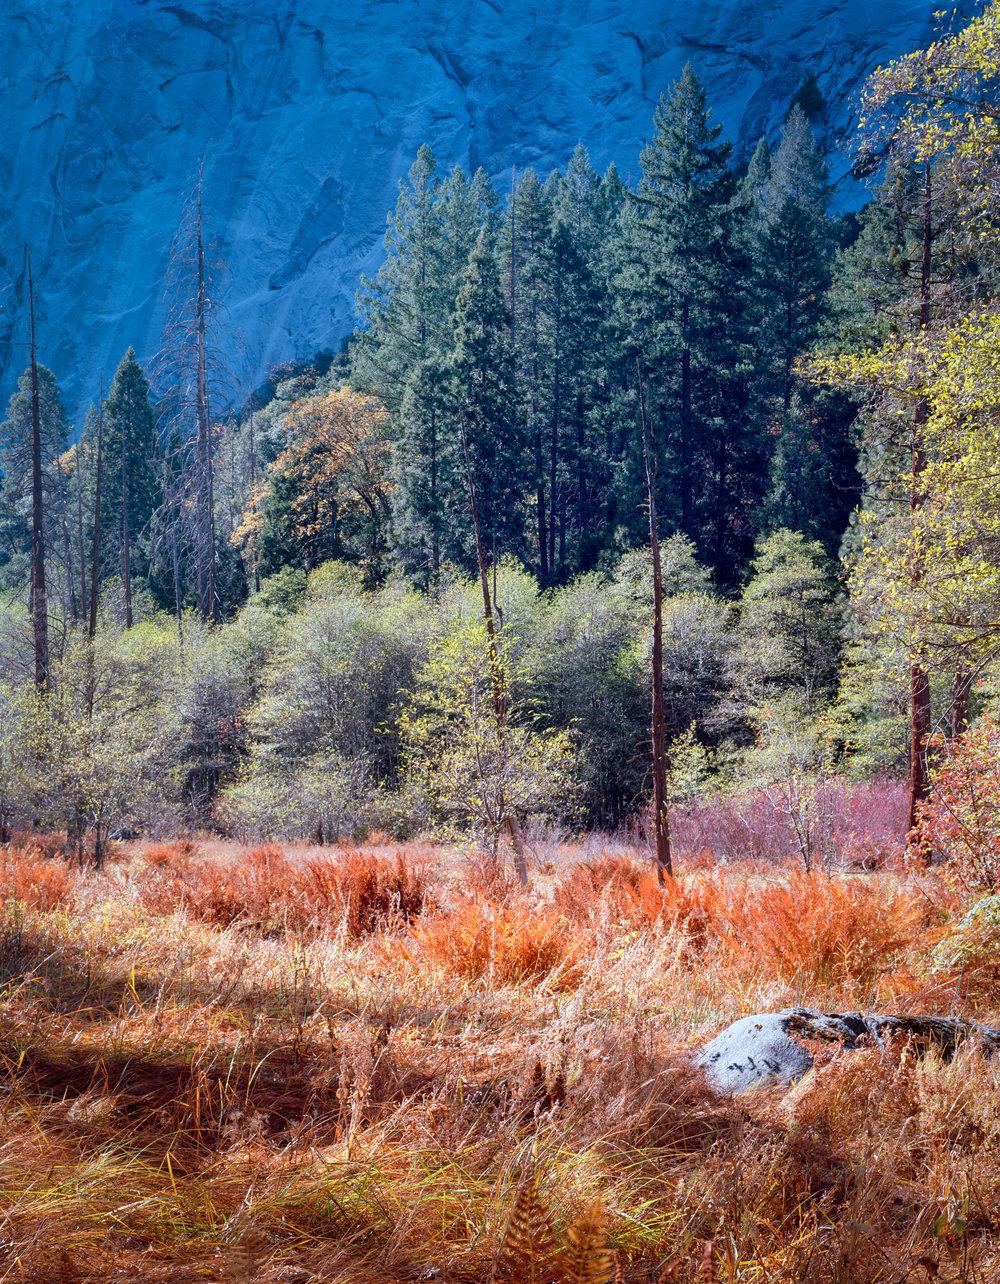 Yosemite cl-0001.jpg